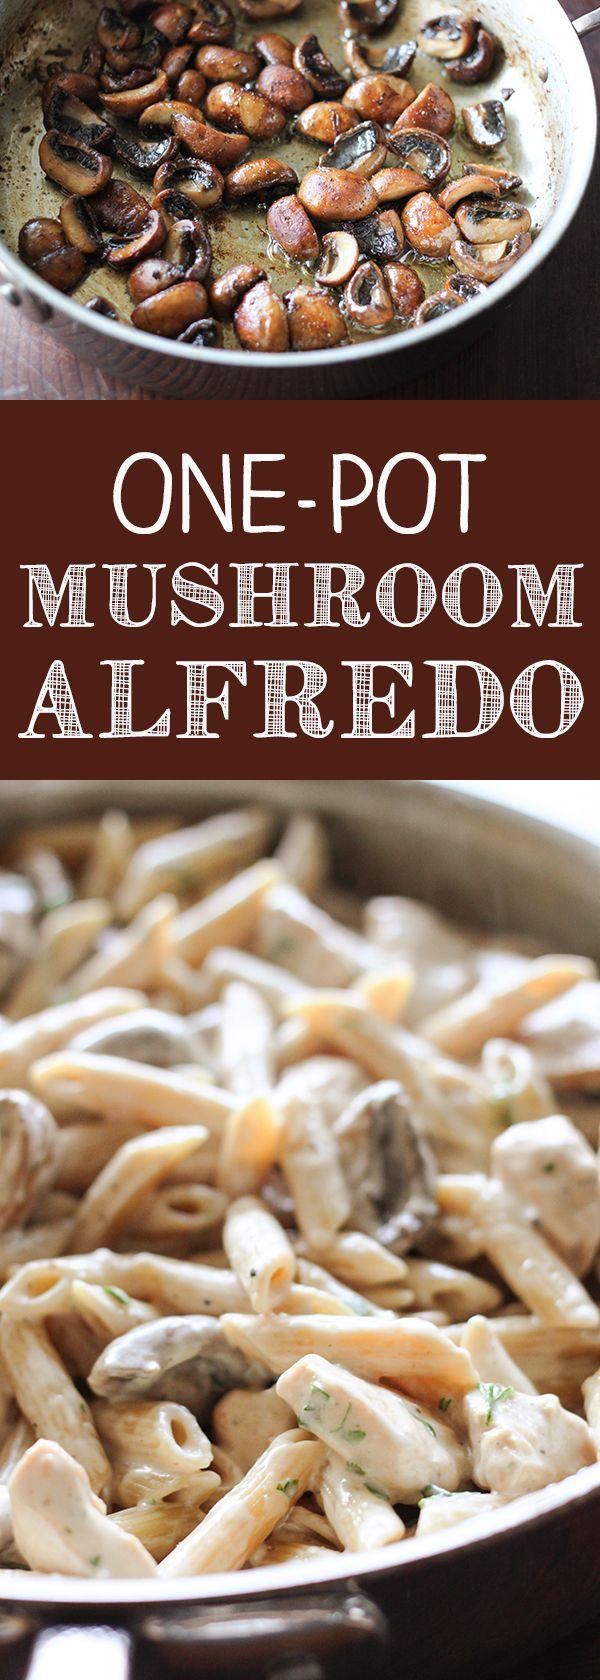 One-Pot Portobello Mushroom Alfredo